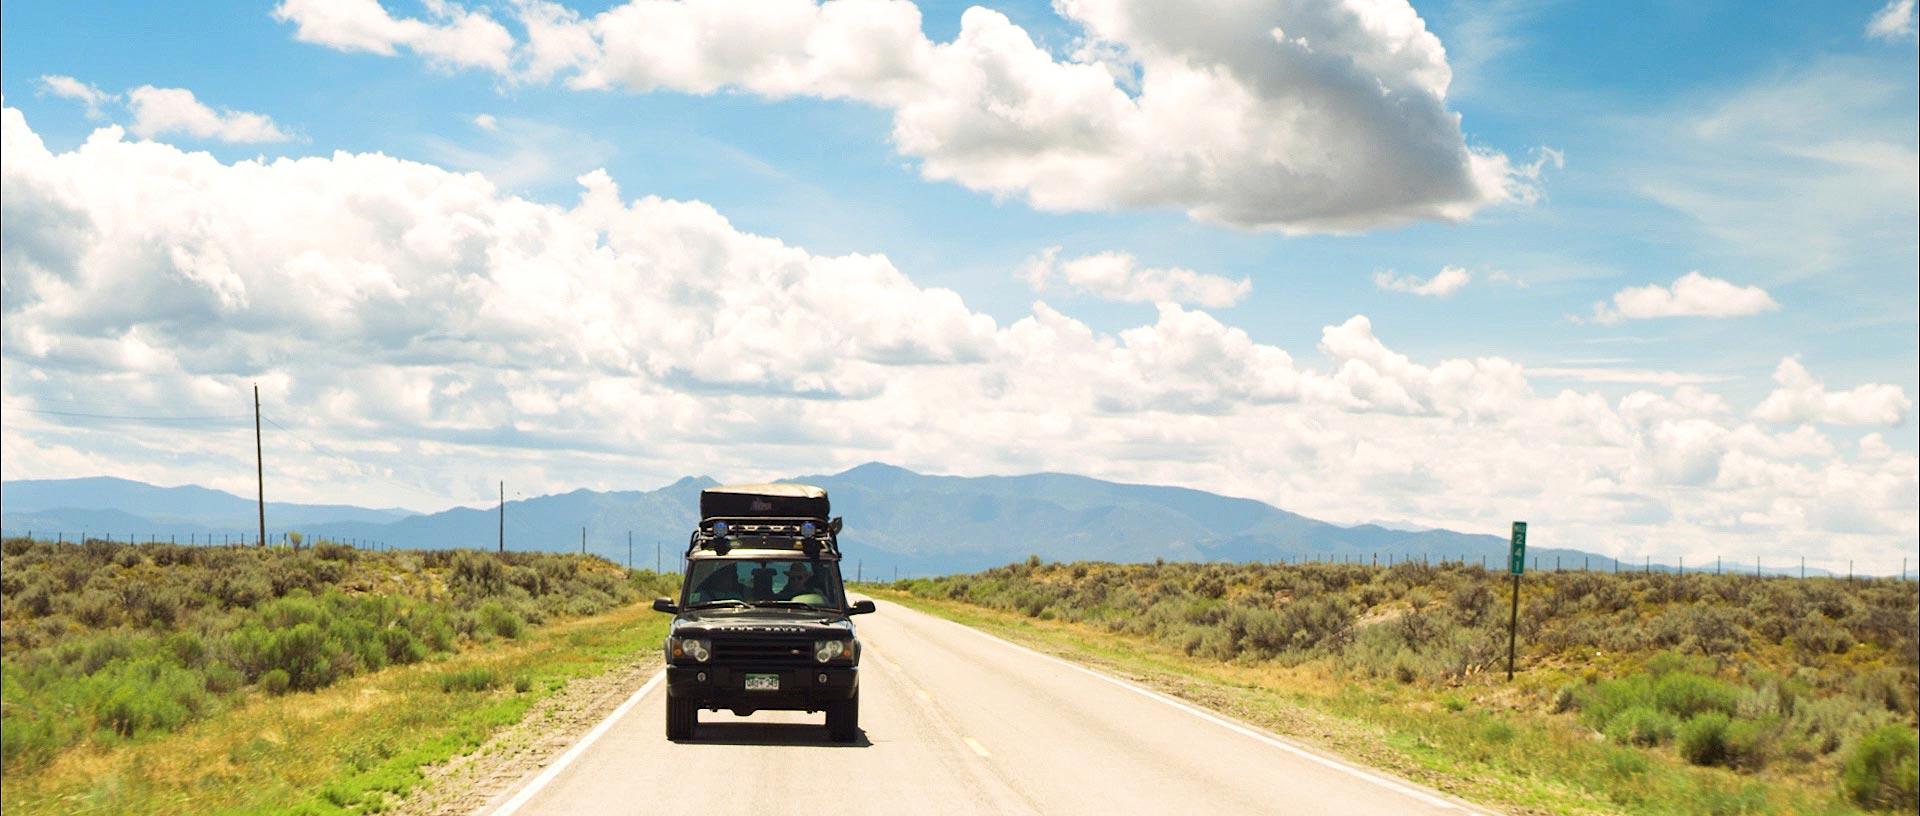 seyahat belgeselleri